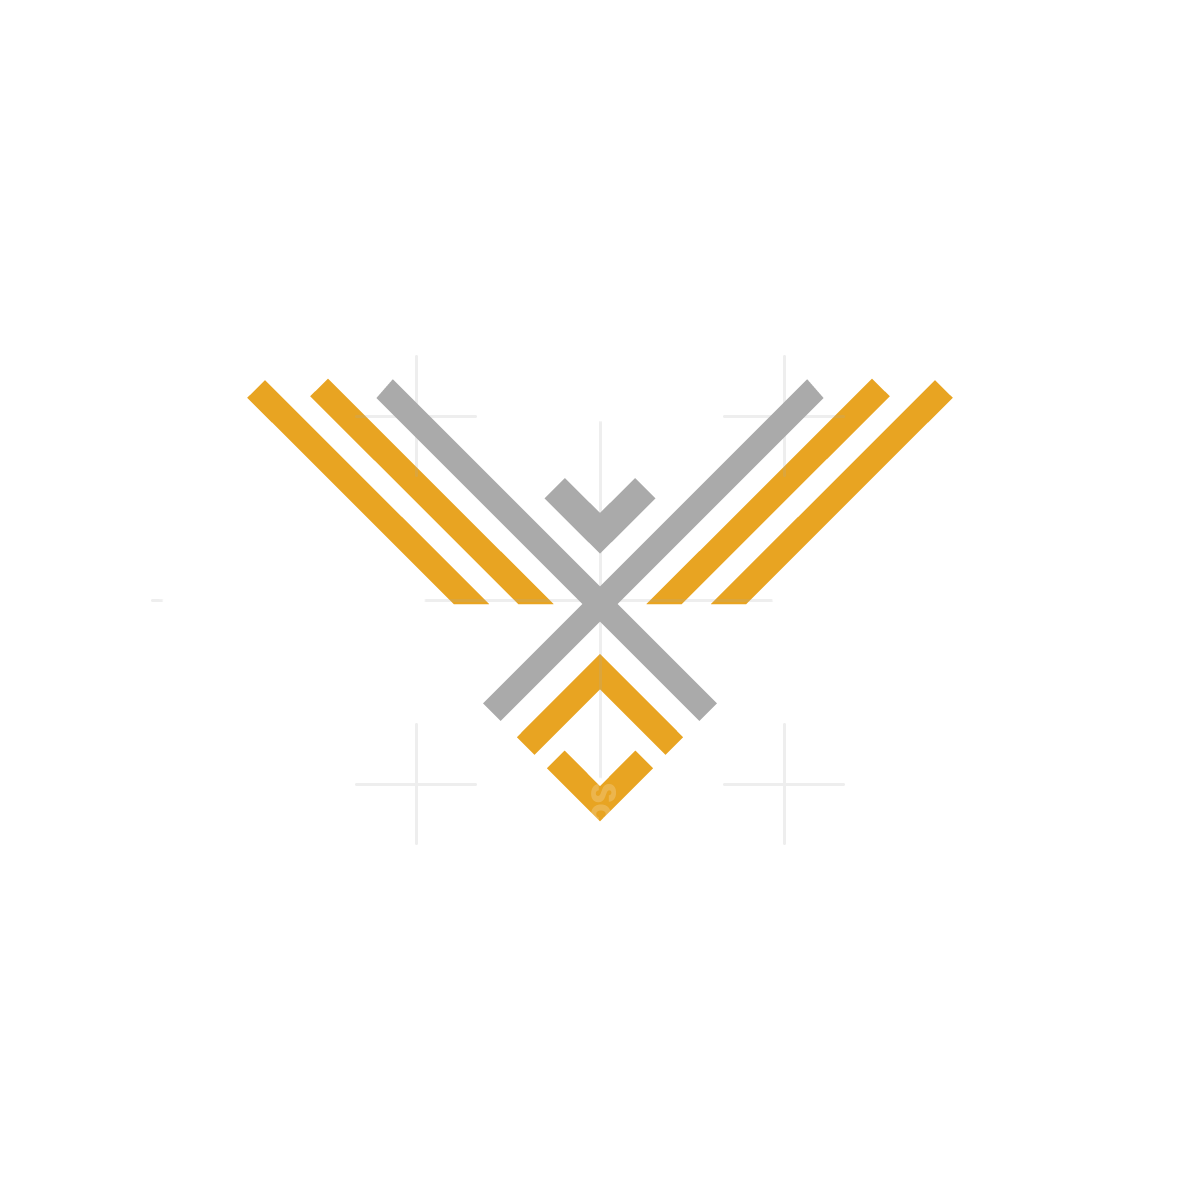 Victorious Eagle Logo